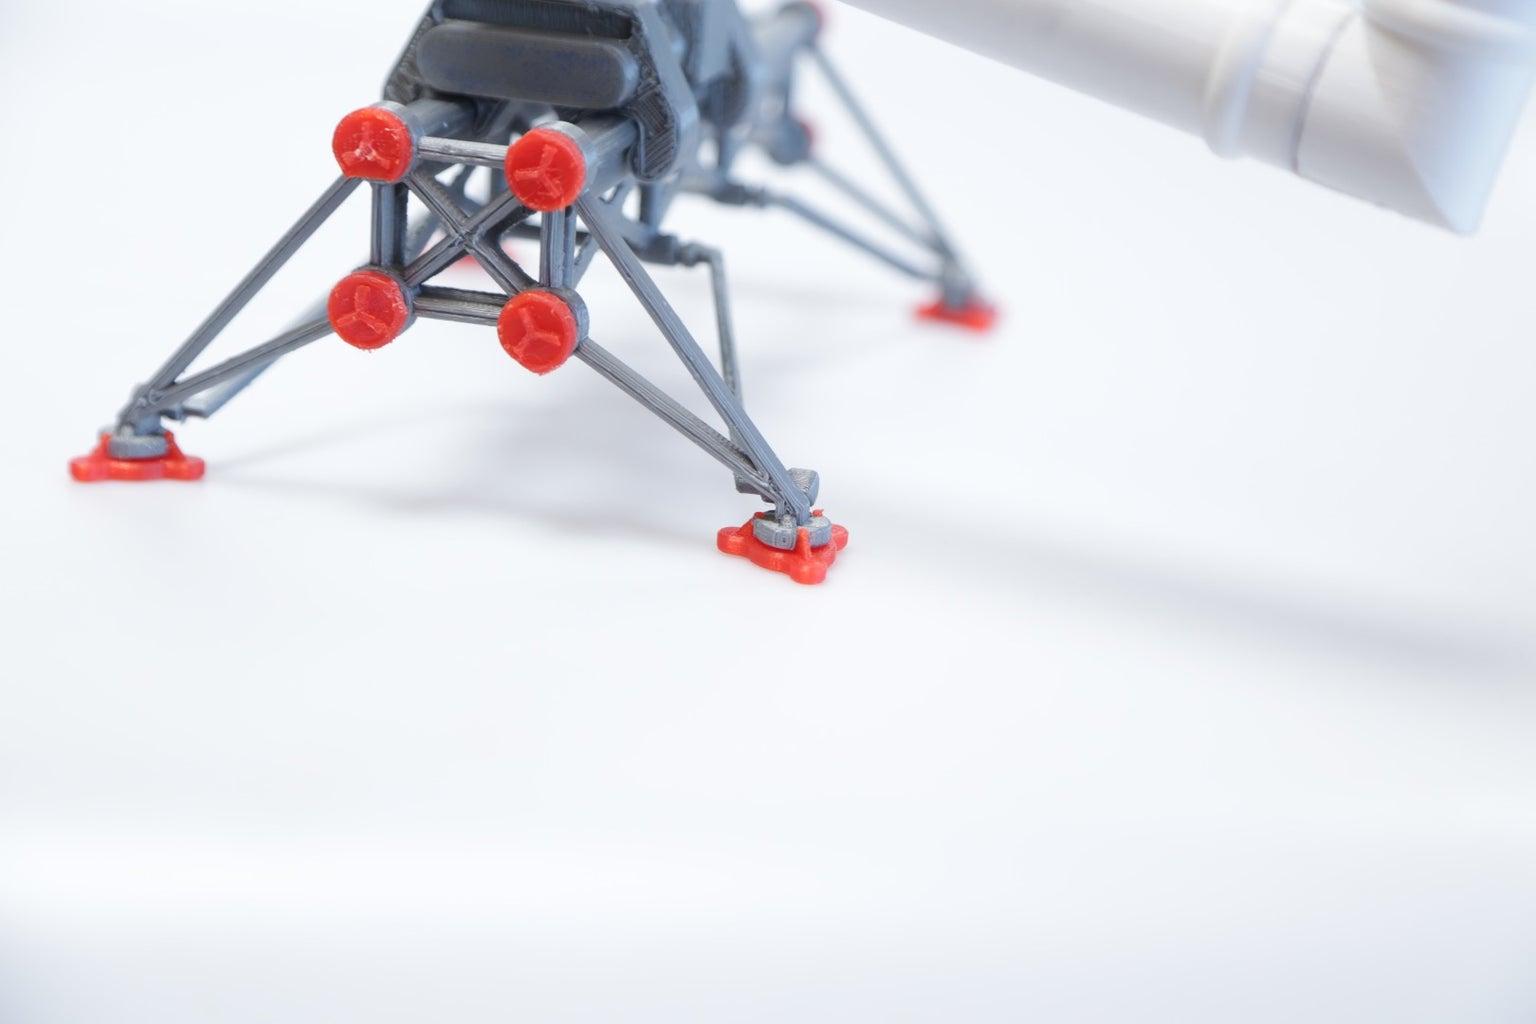 3d Printed Canadarm Model